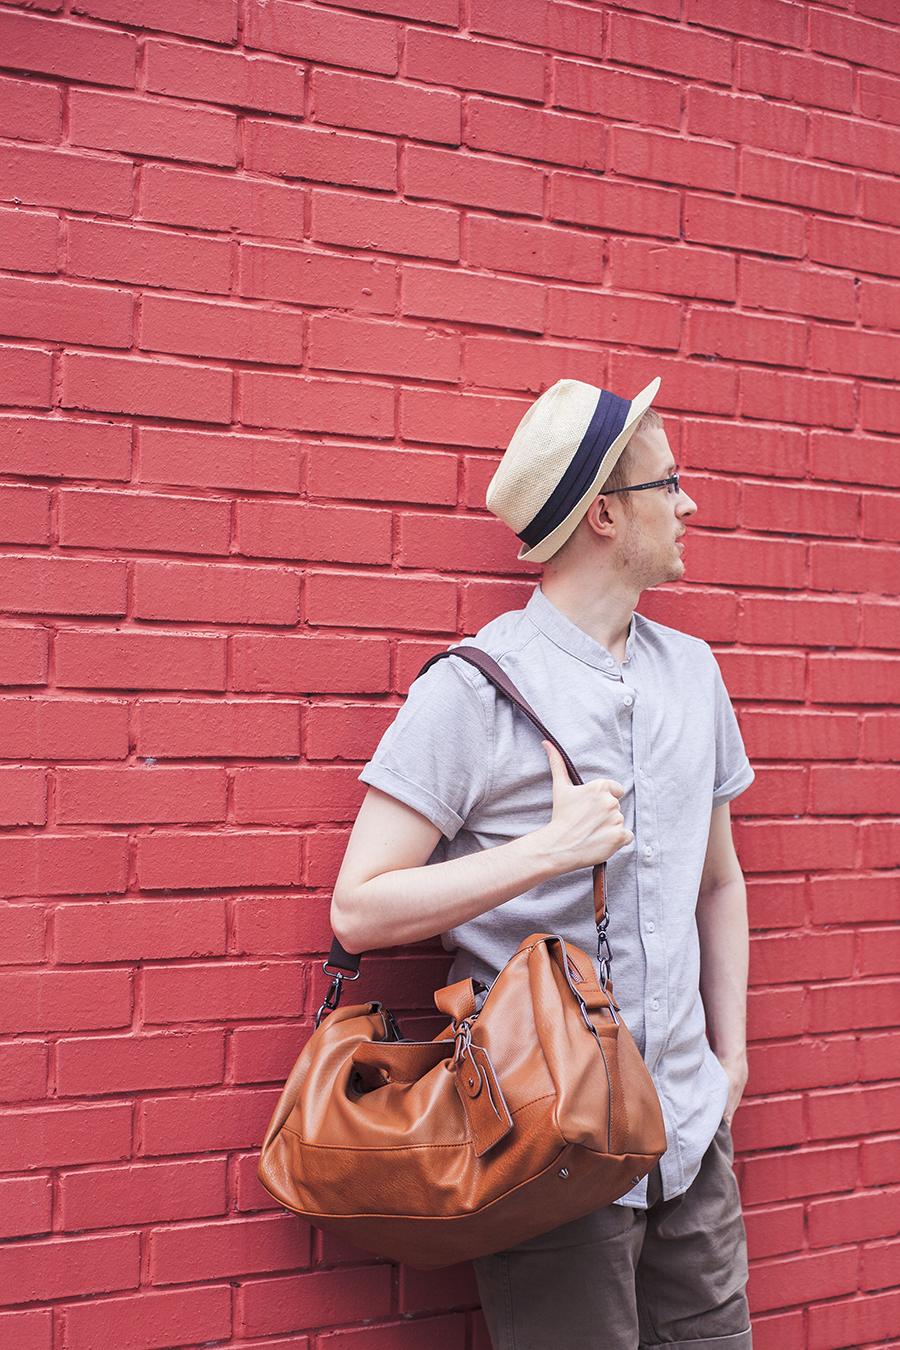 ThisGuyAh outfit: Zalora mandarin collar polo shirt, The Academy Branch shorts, ALDO duffle bag.